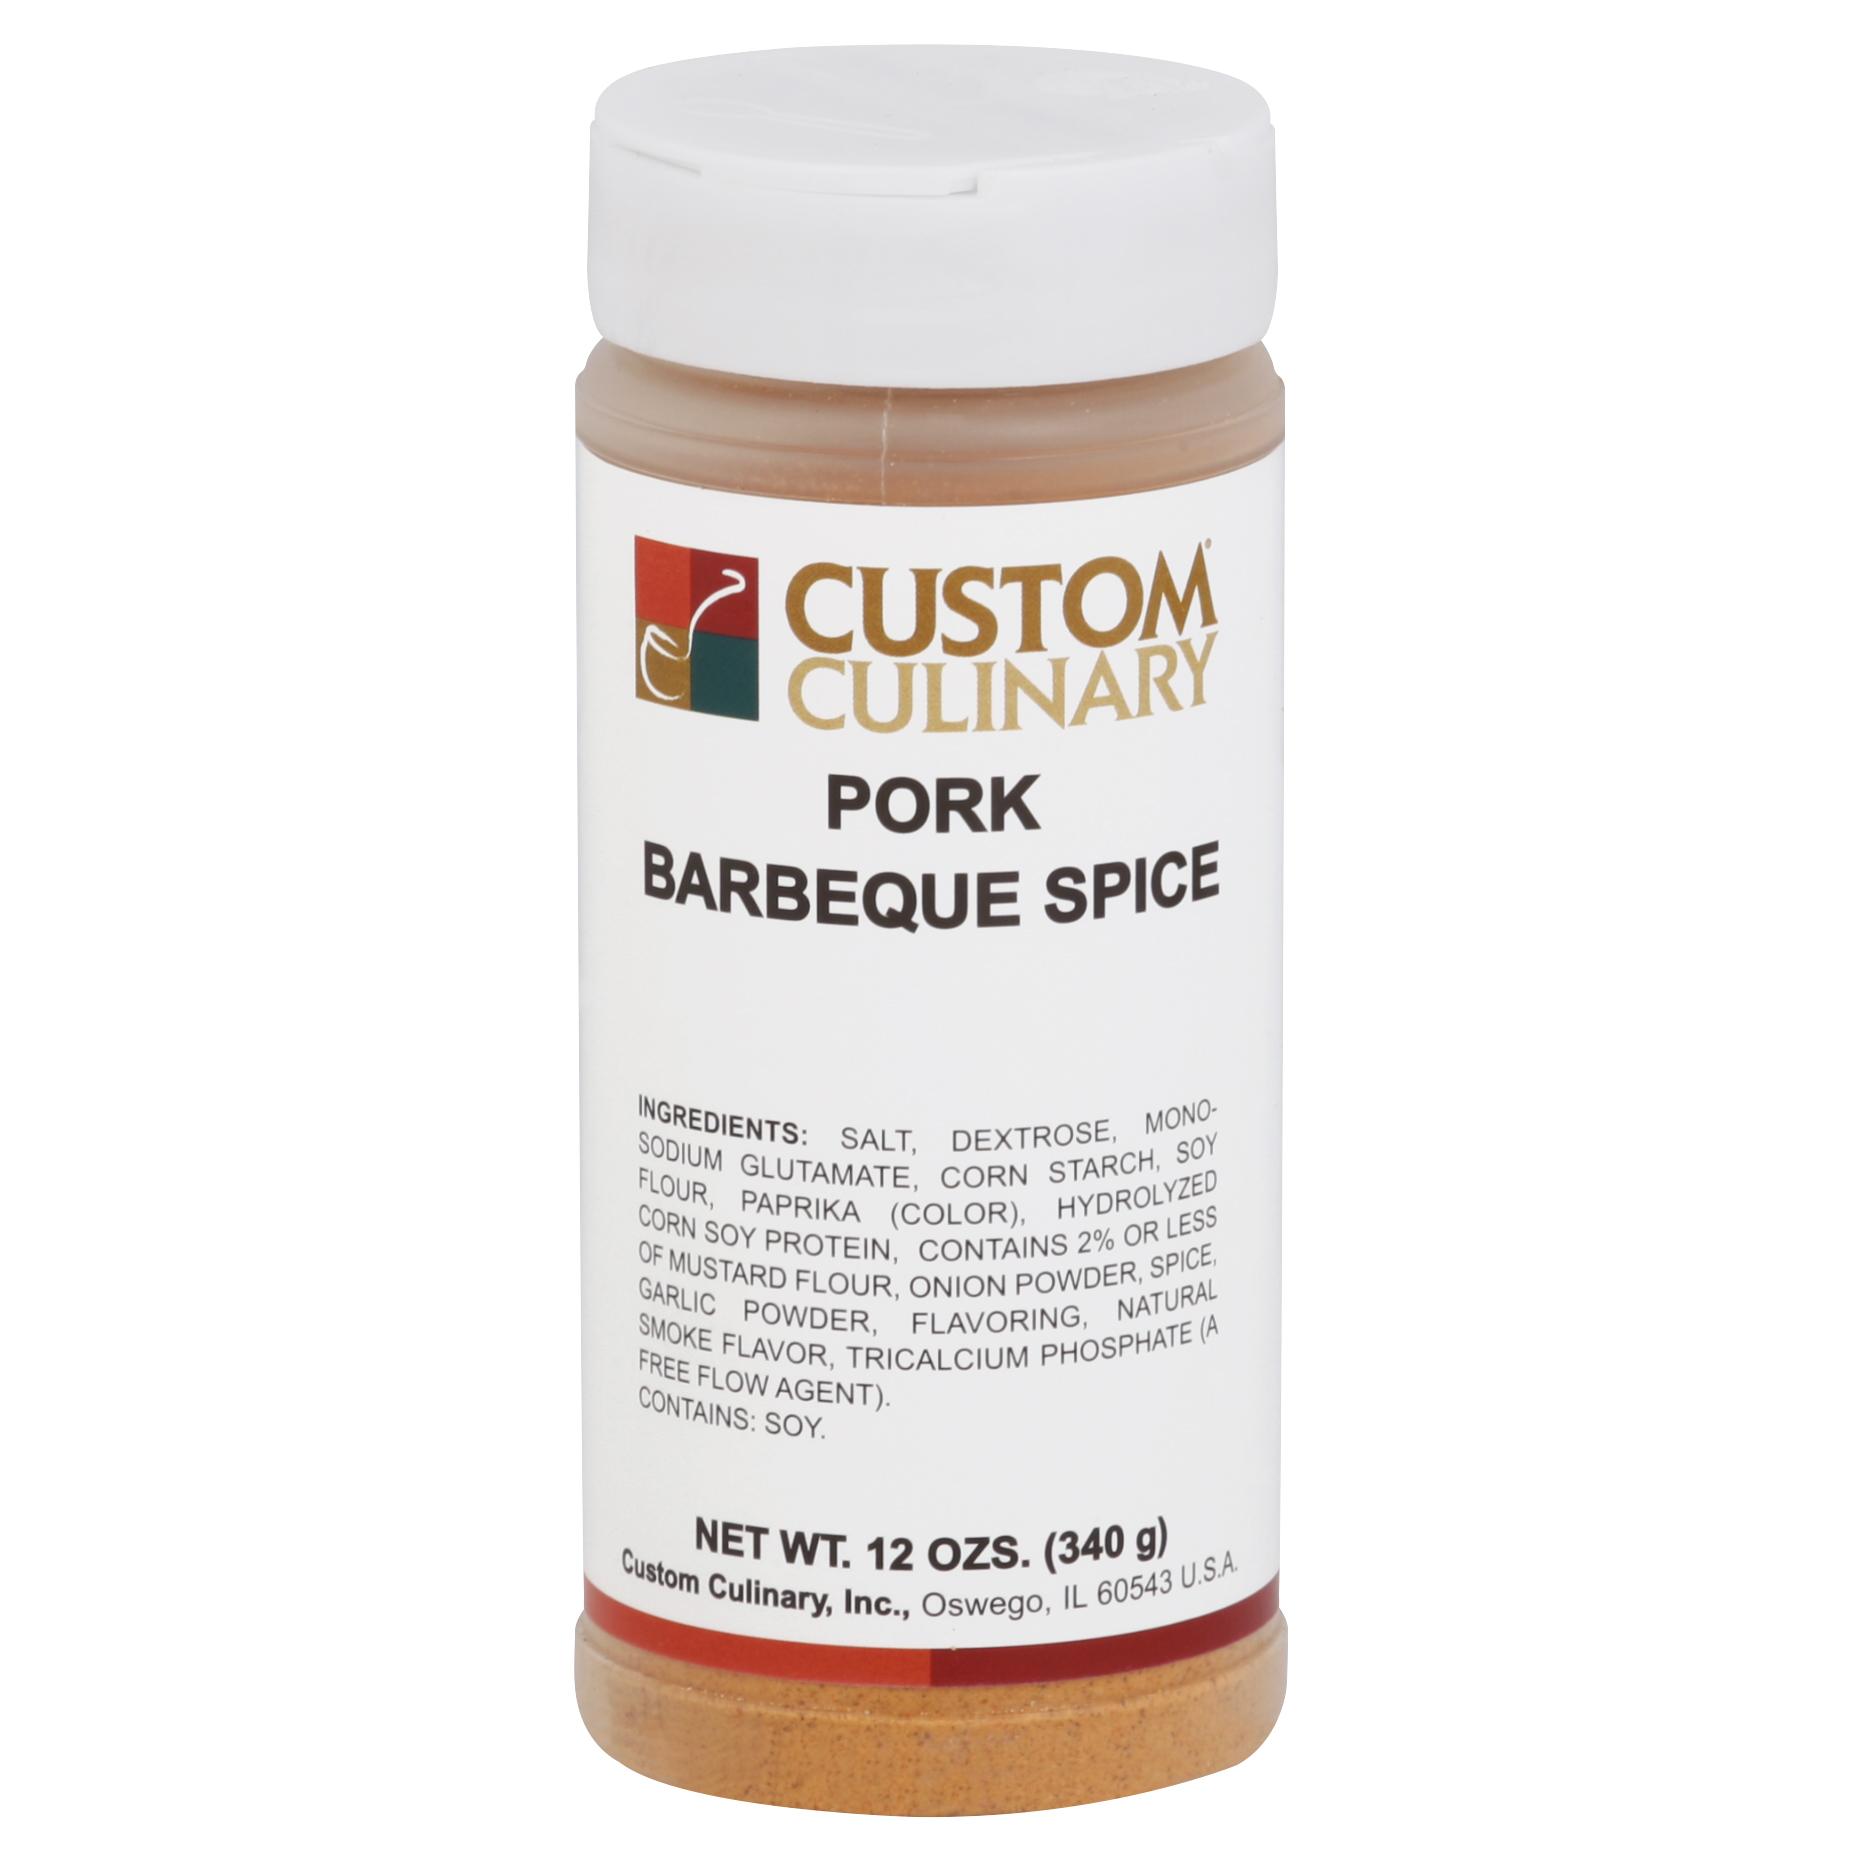 0763 - Pork Barbeque Spice